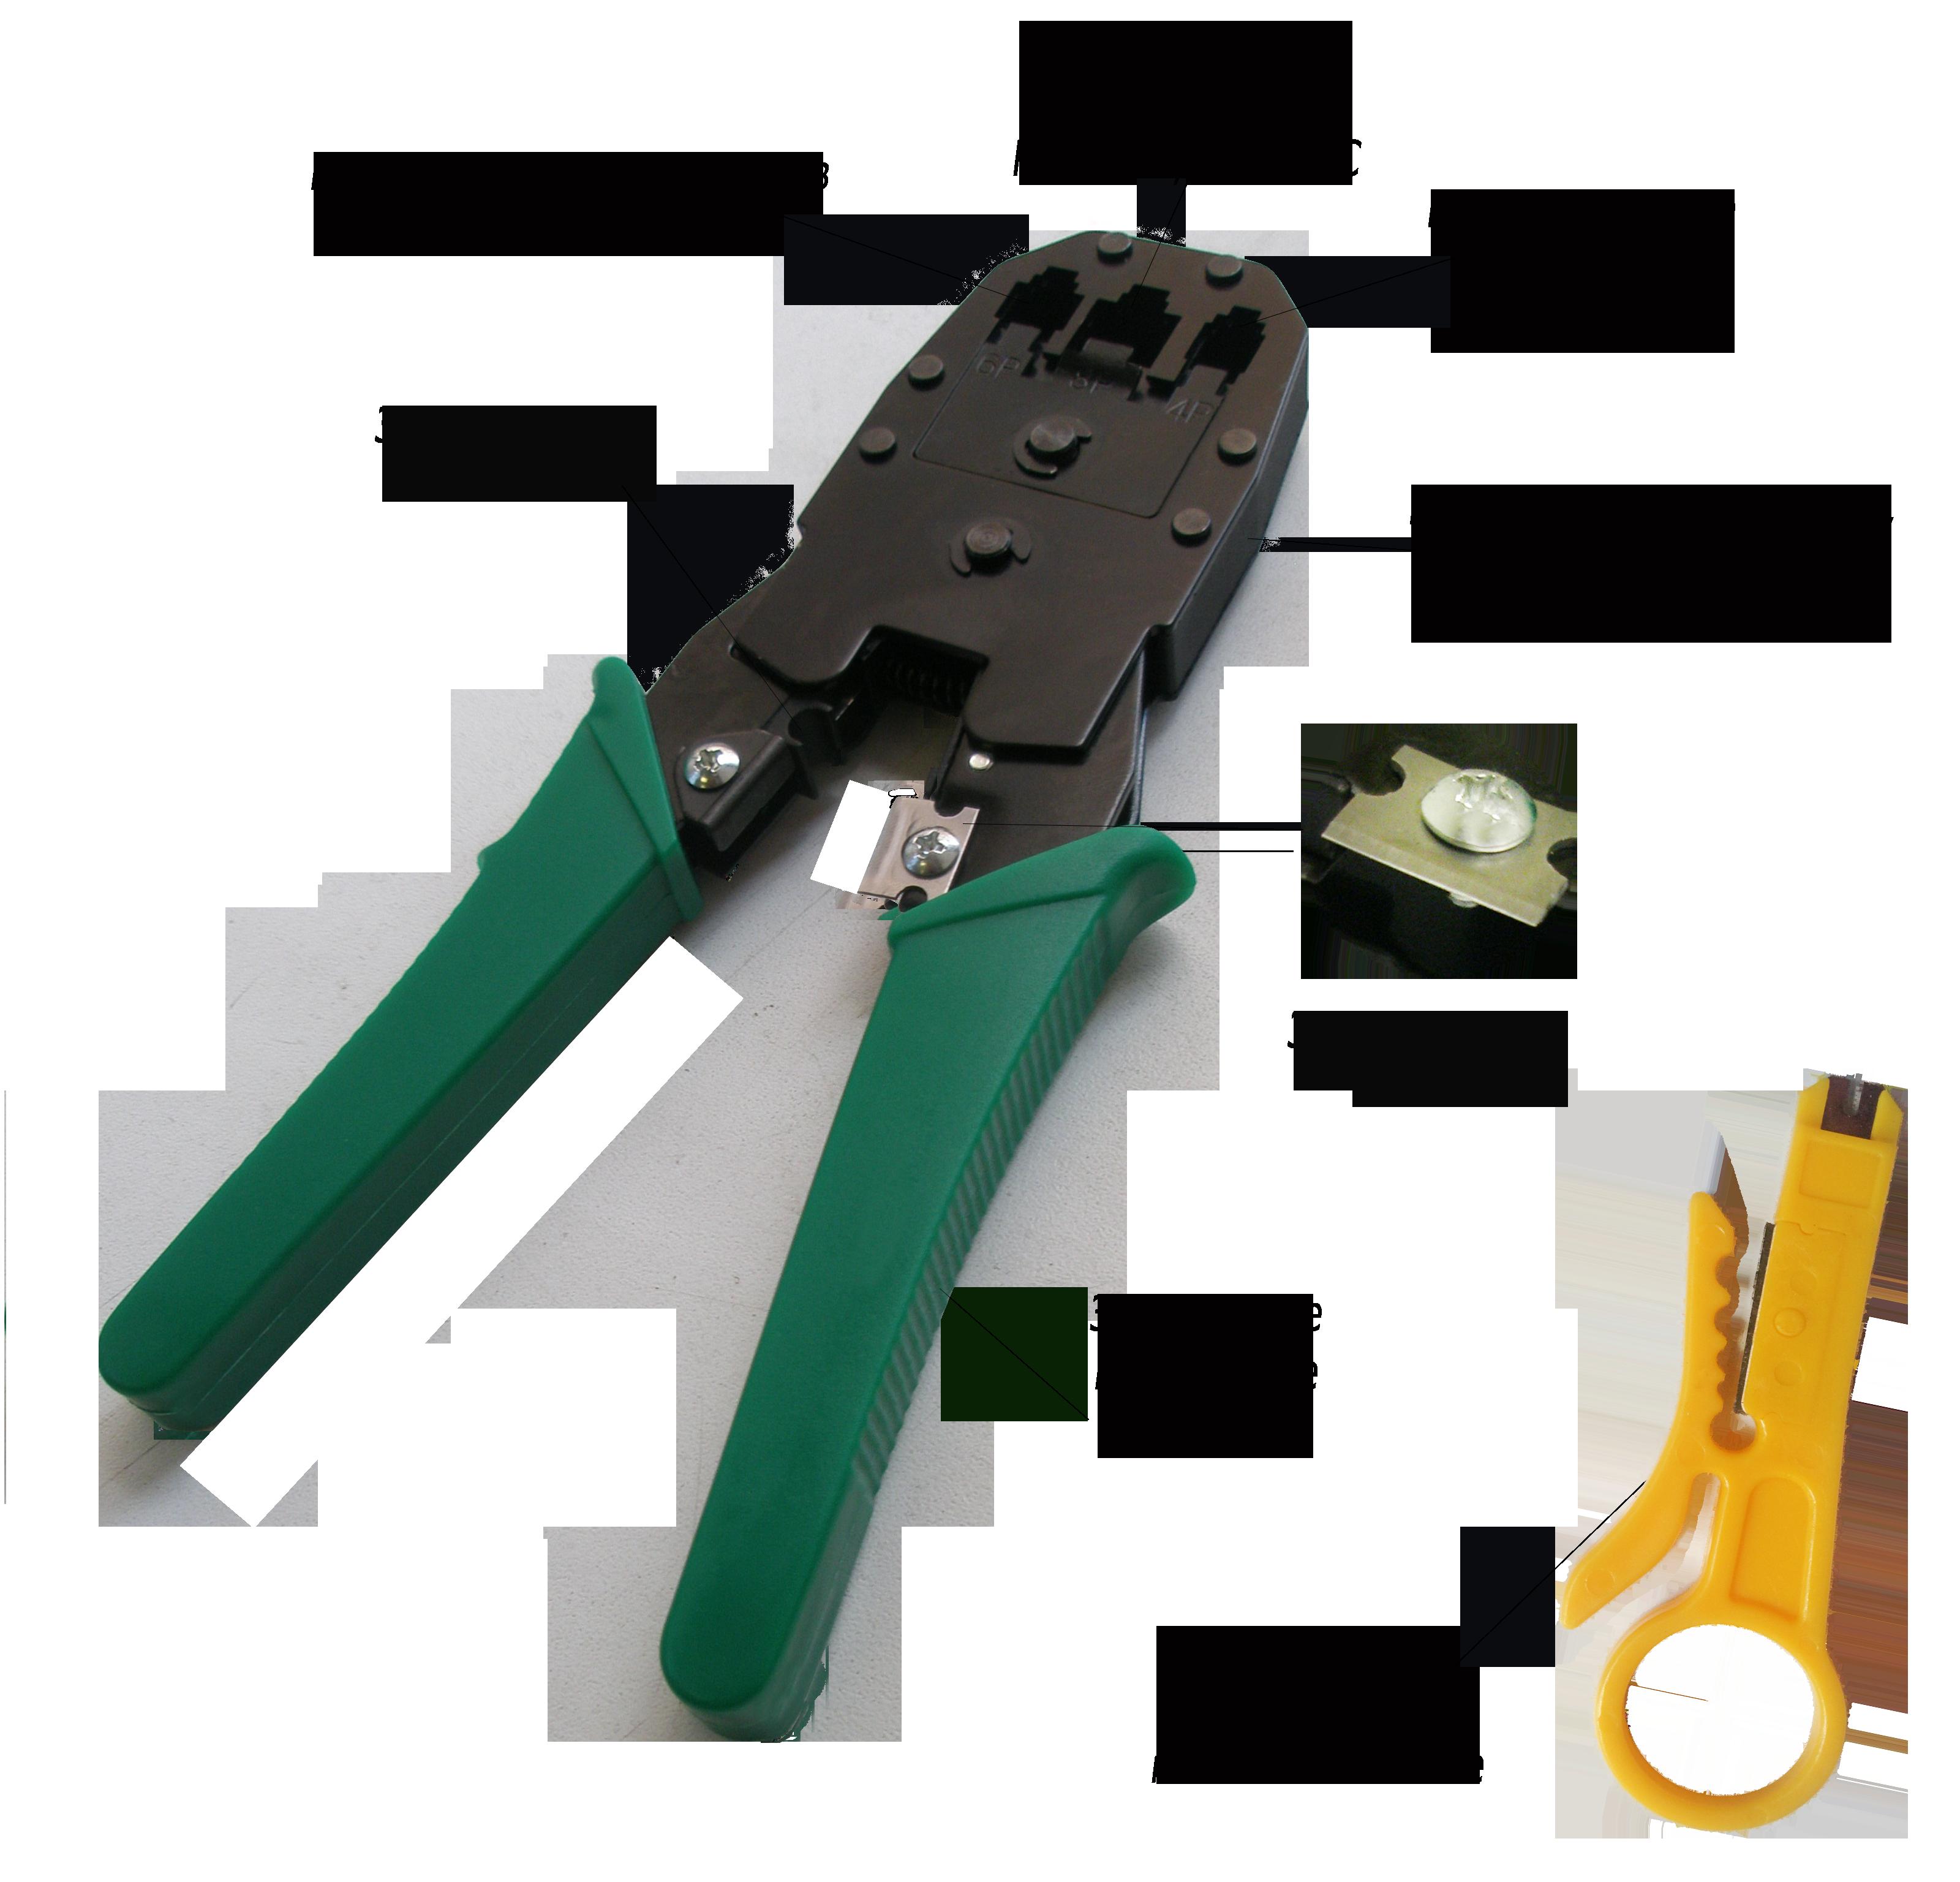 009-100002Кримпер для обжима 8P-8C / 6P-6C / 4P-4C (HT-200),(HT-315)